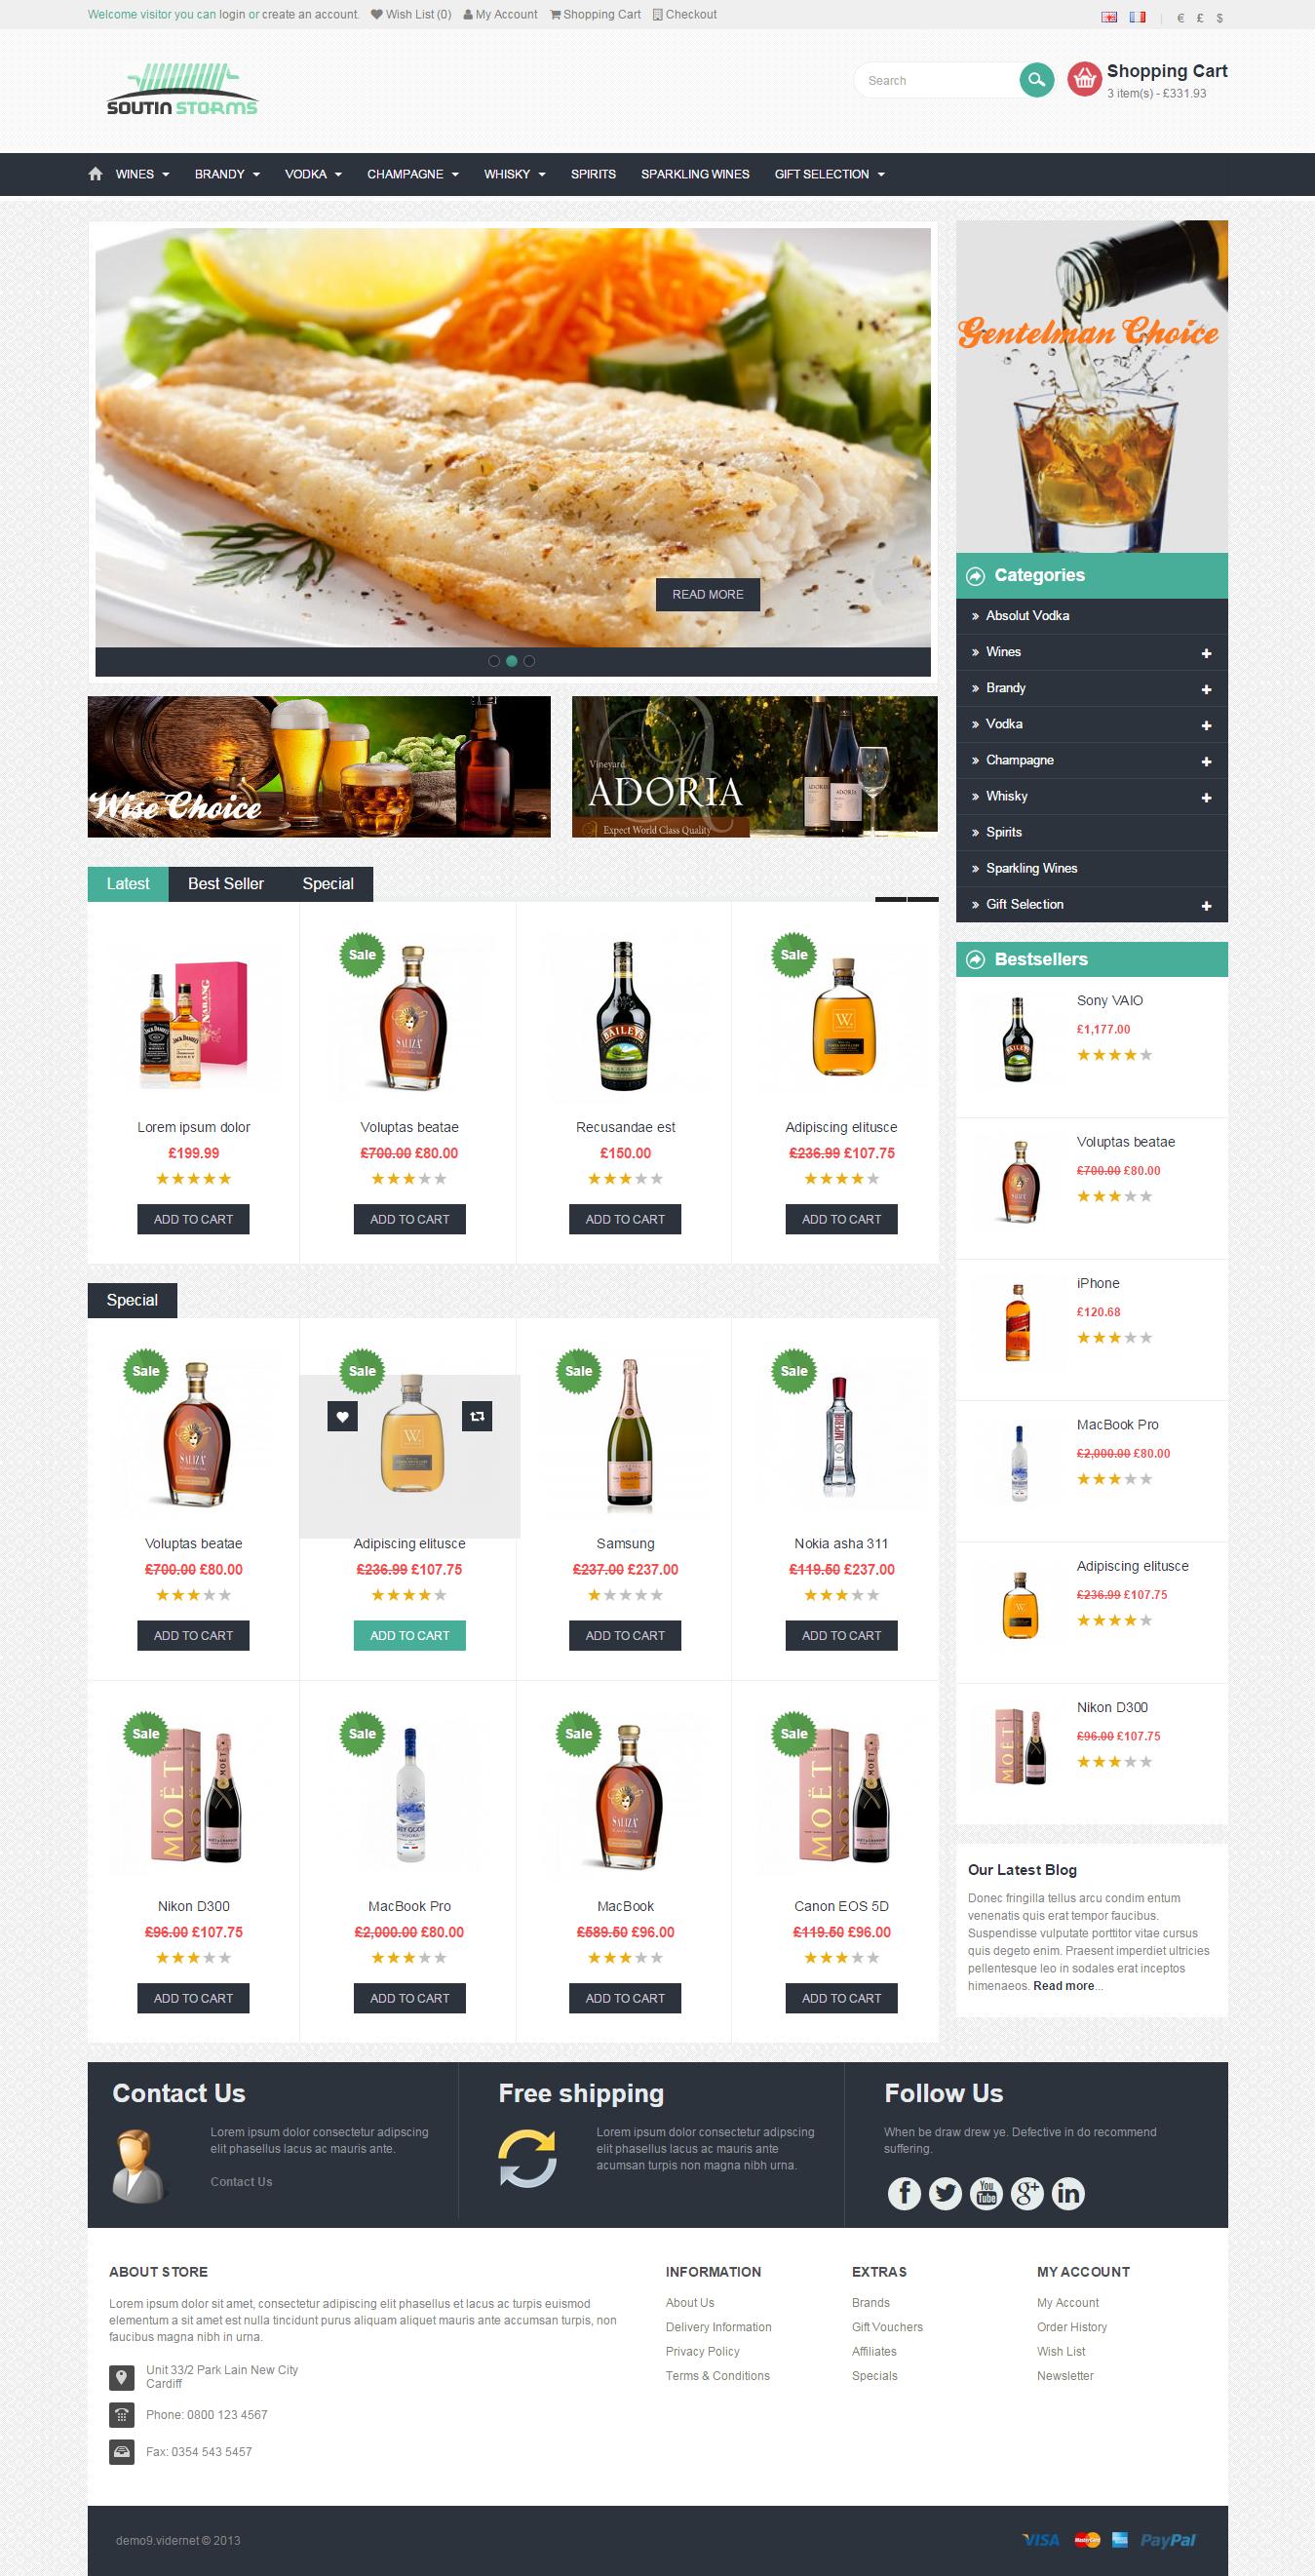 Website Shopping Cart Site / eCommerce Shop